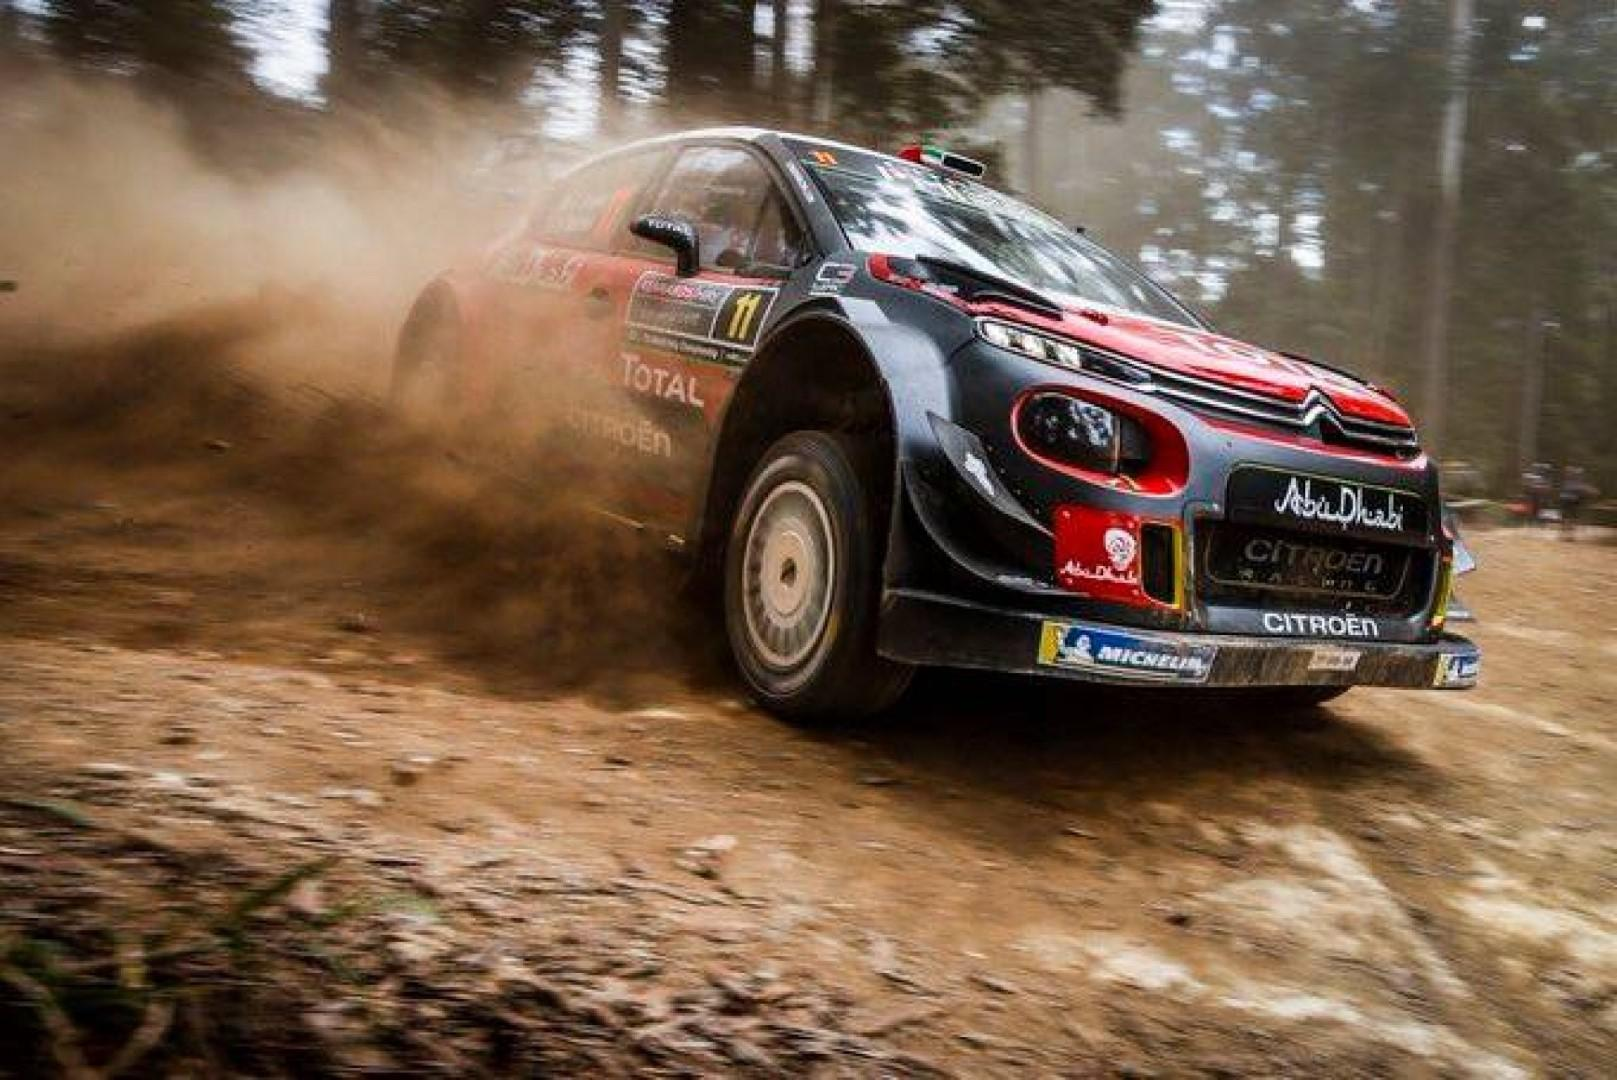 Rallye d'Australie 2018 : Mads Ostberg leader